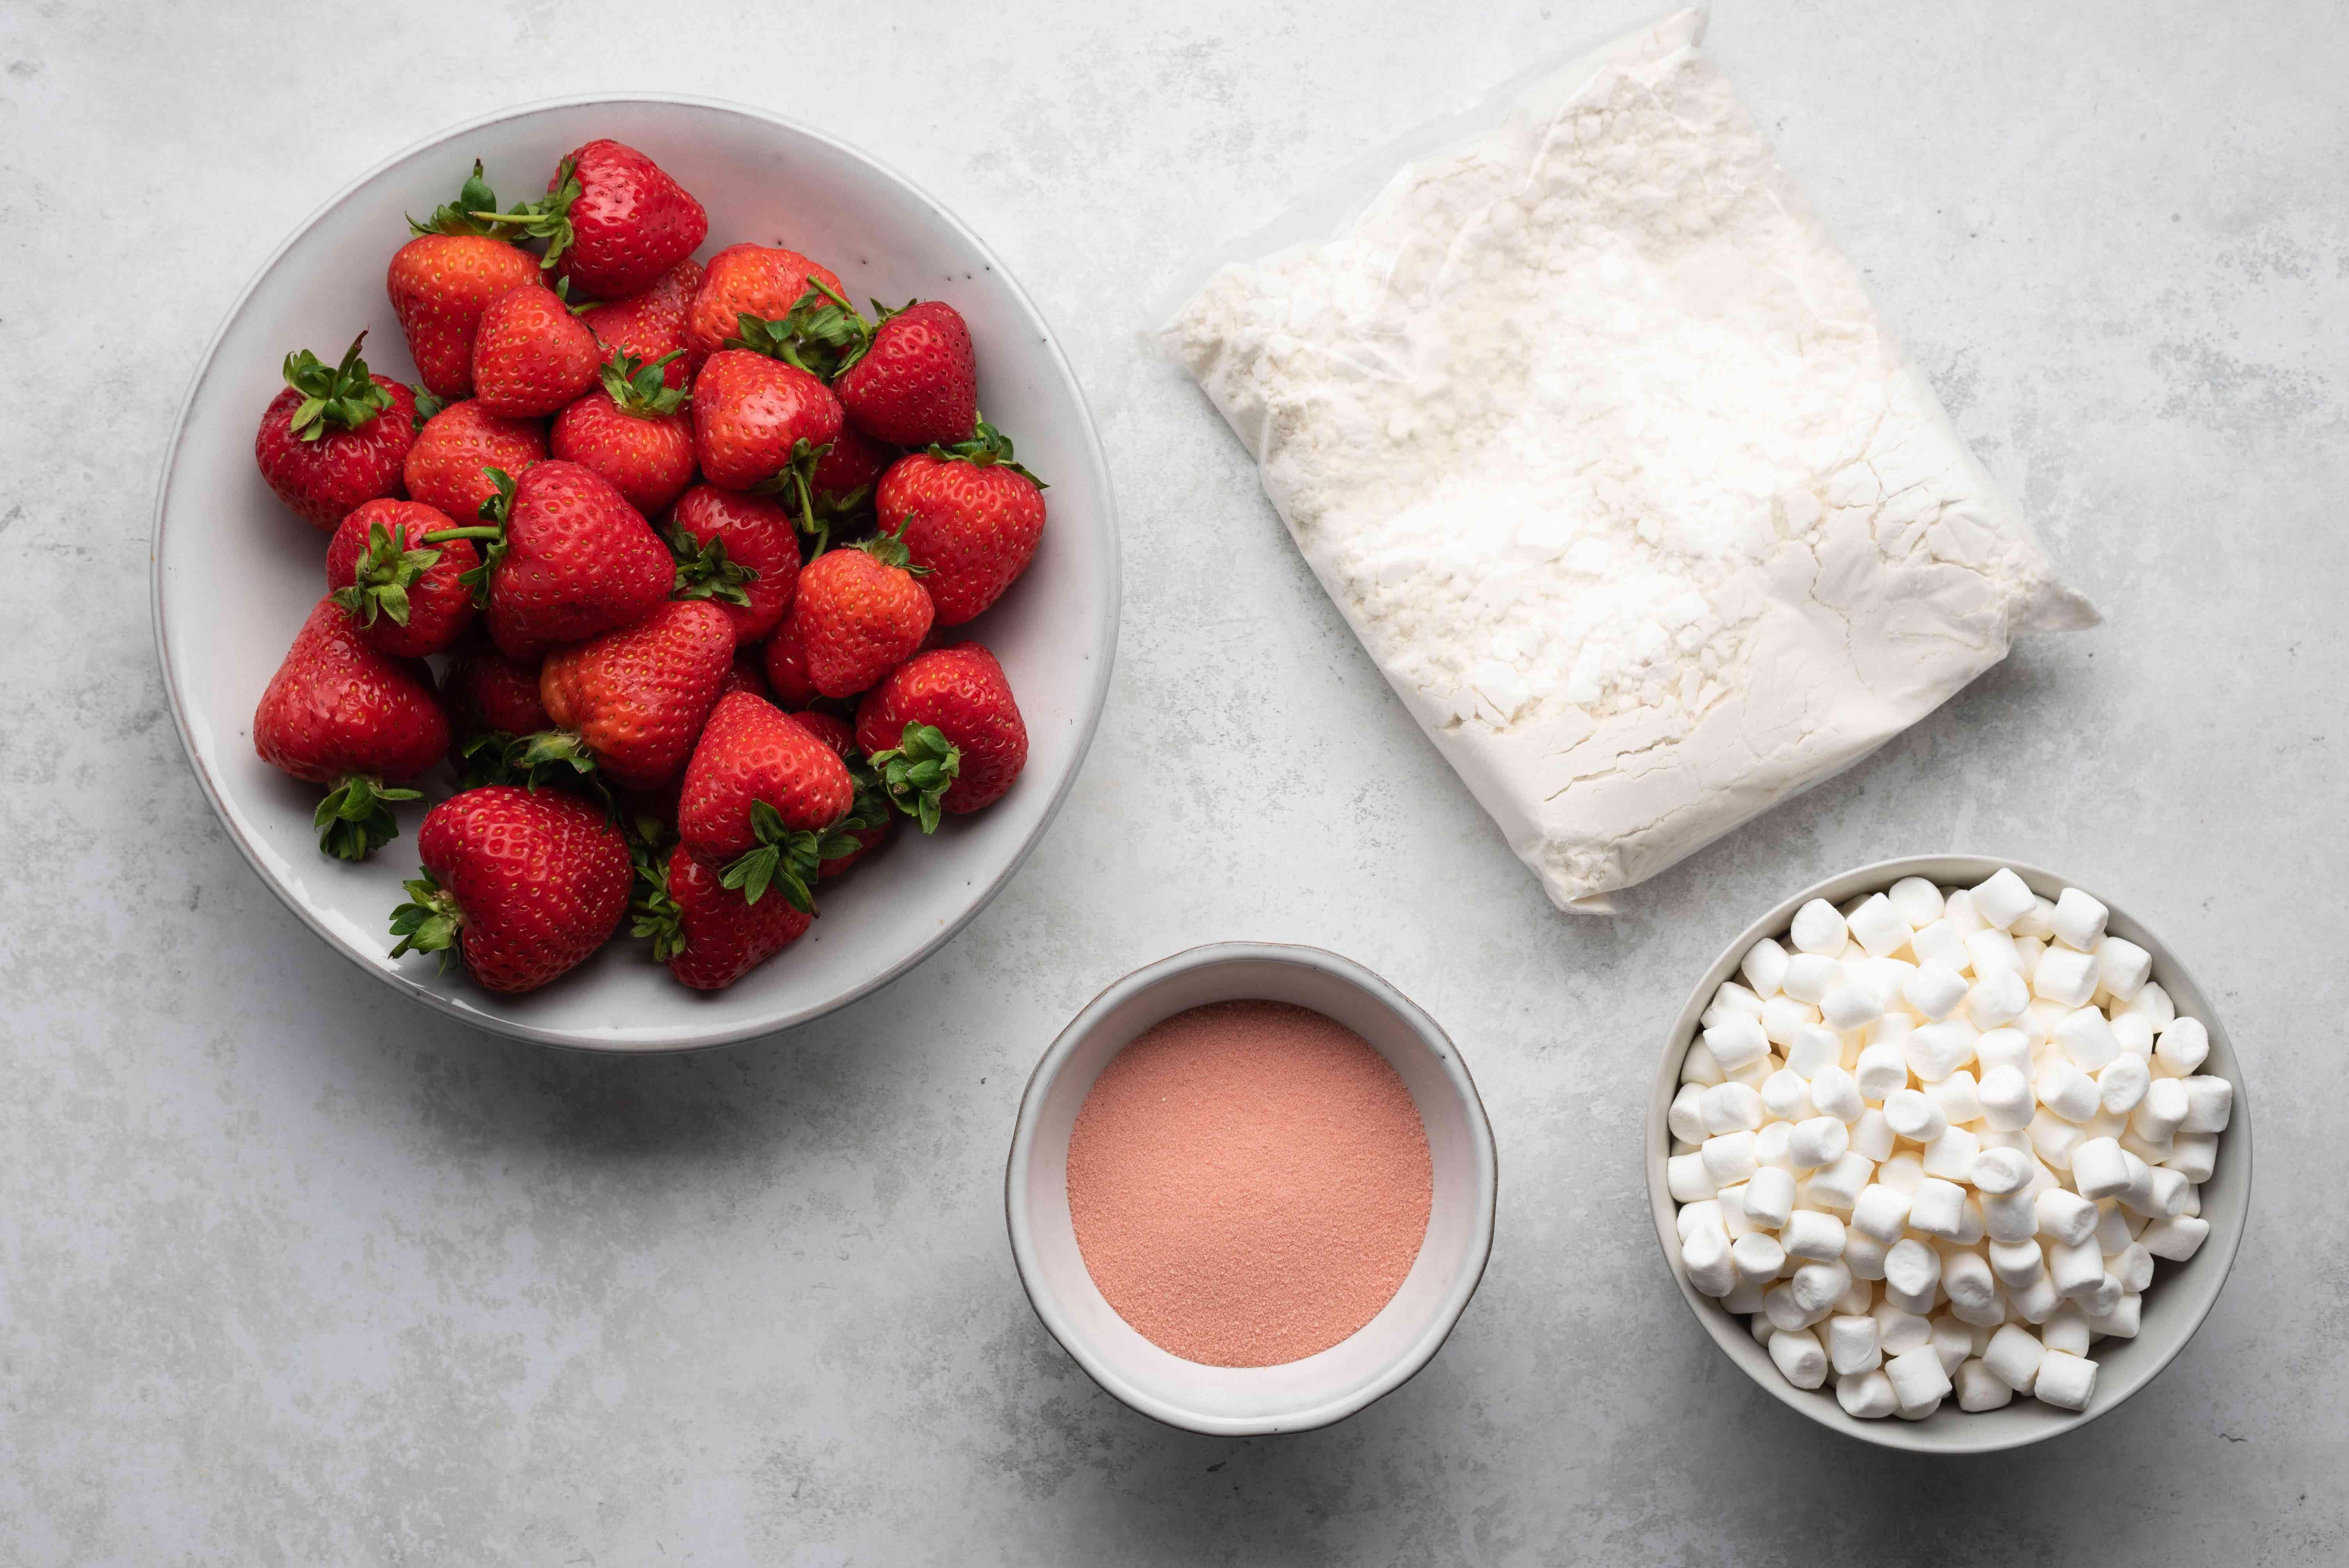 Easy Strawberry Shortcut Cake ingredients